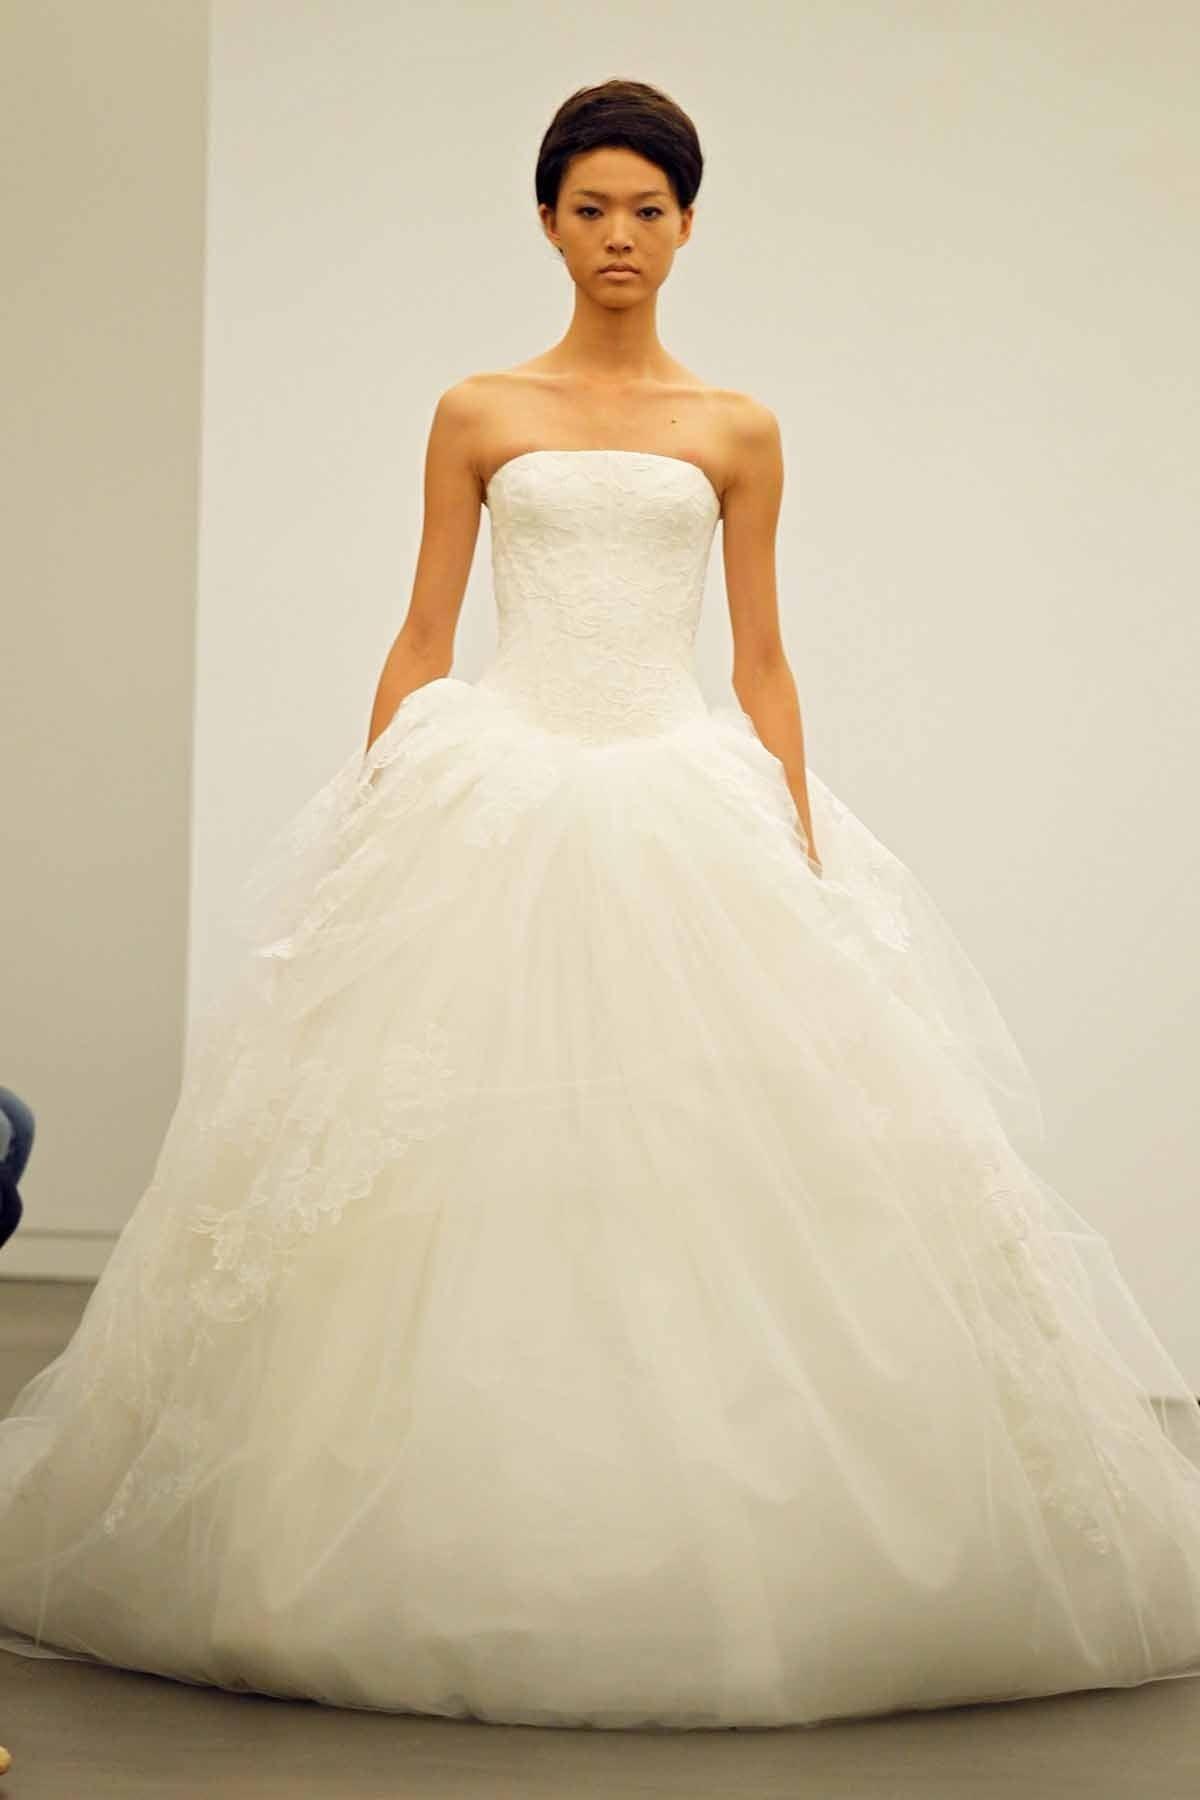 Red wedding dresses vera wang  My dream dress Thank you God for Vera Wang  Wedding  Pinterest